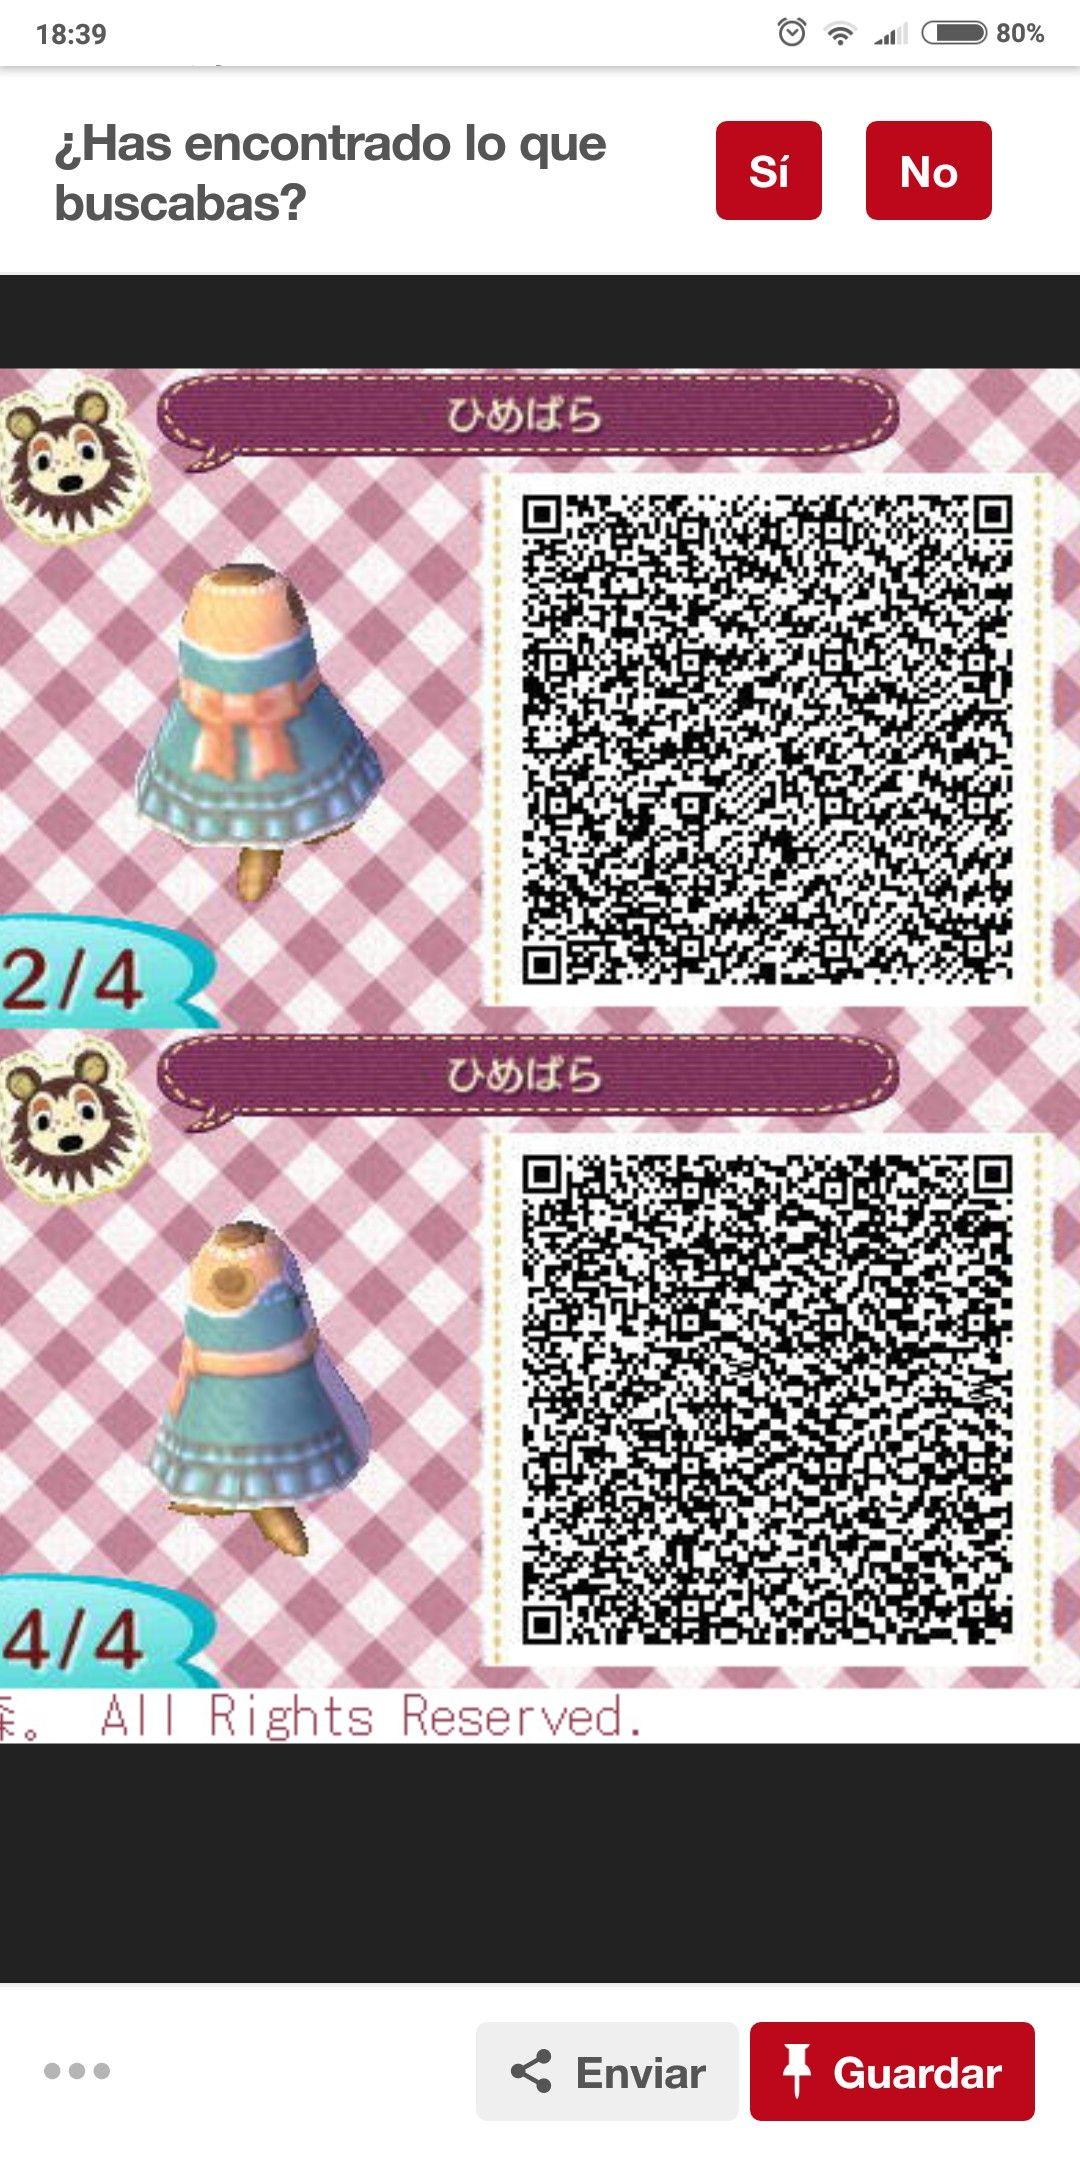 Pin By Tiaralee Romero On Animal Crossing Stuff Animal Crossing Qr Animal Crossing Qr Codes Animals